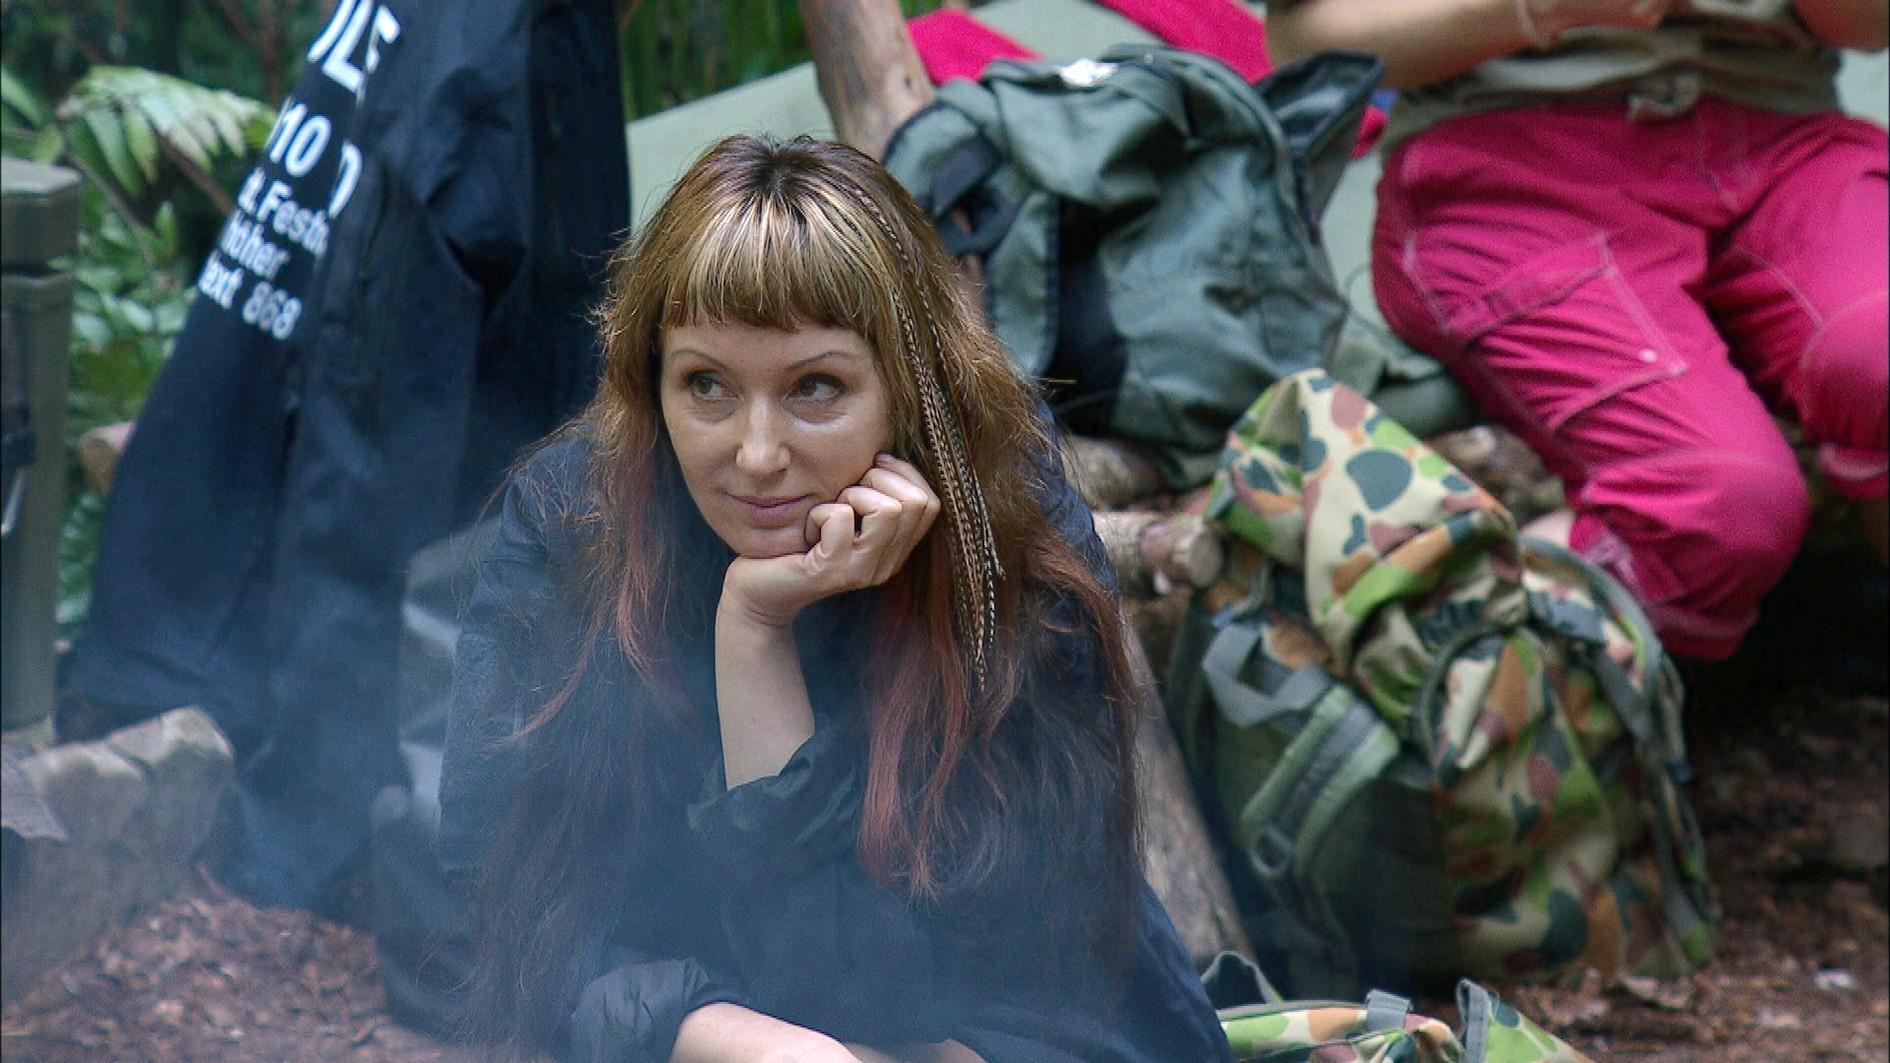 Dschungelcamp 2017 Tag 10 - Hanka Rackwitz